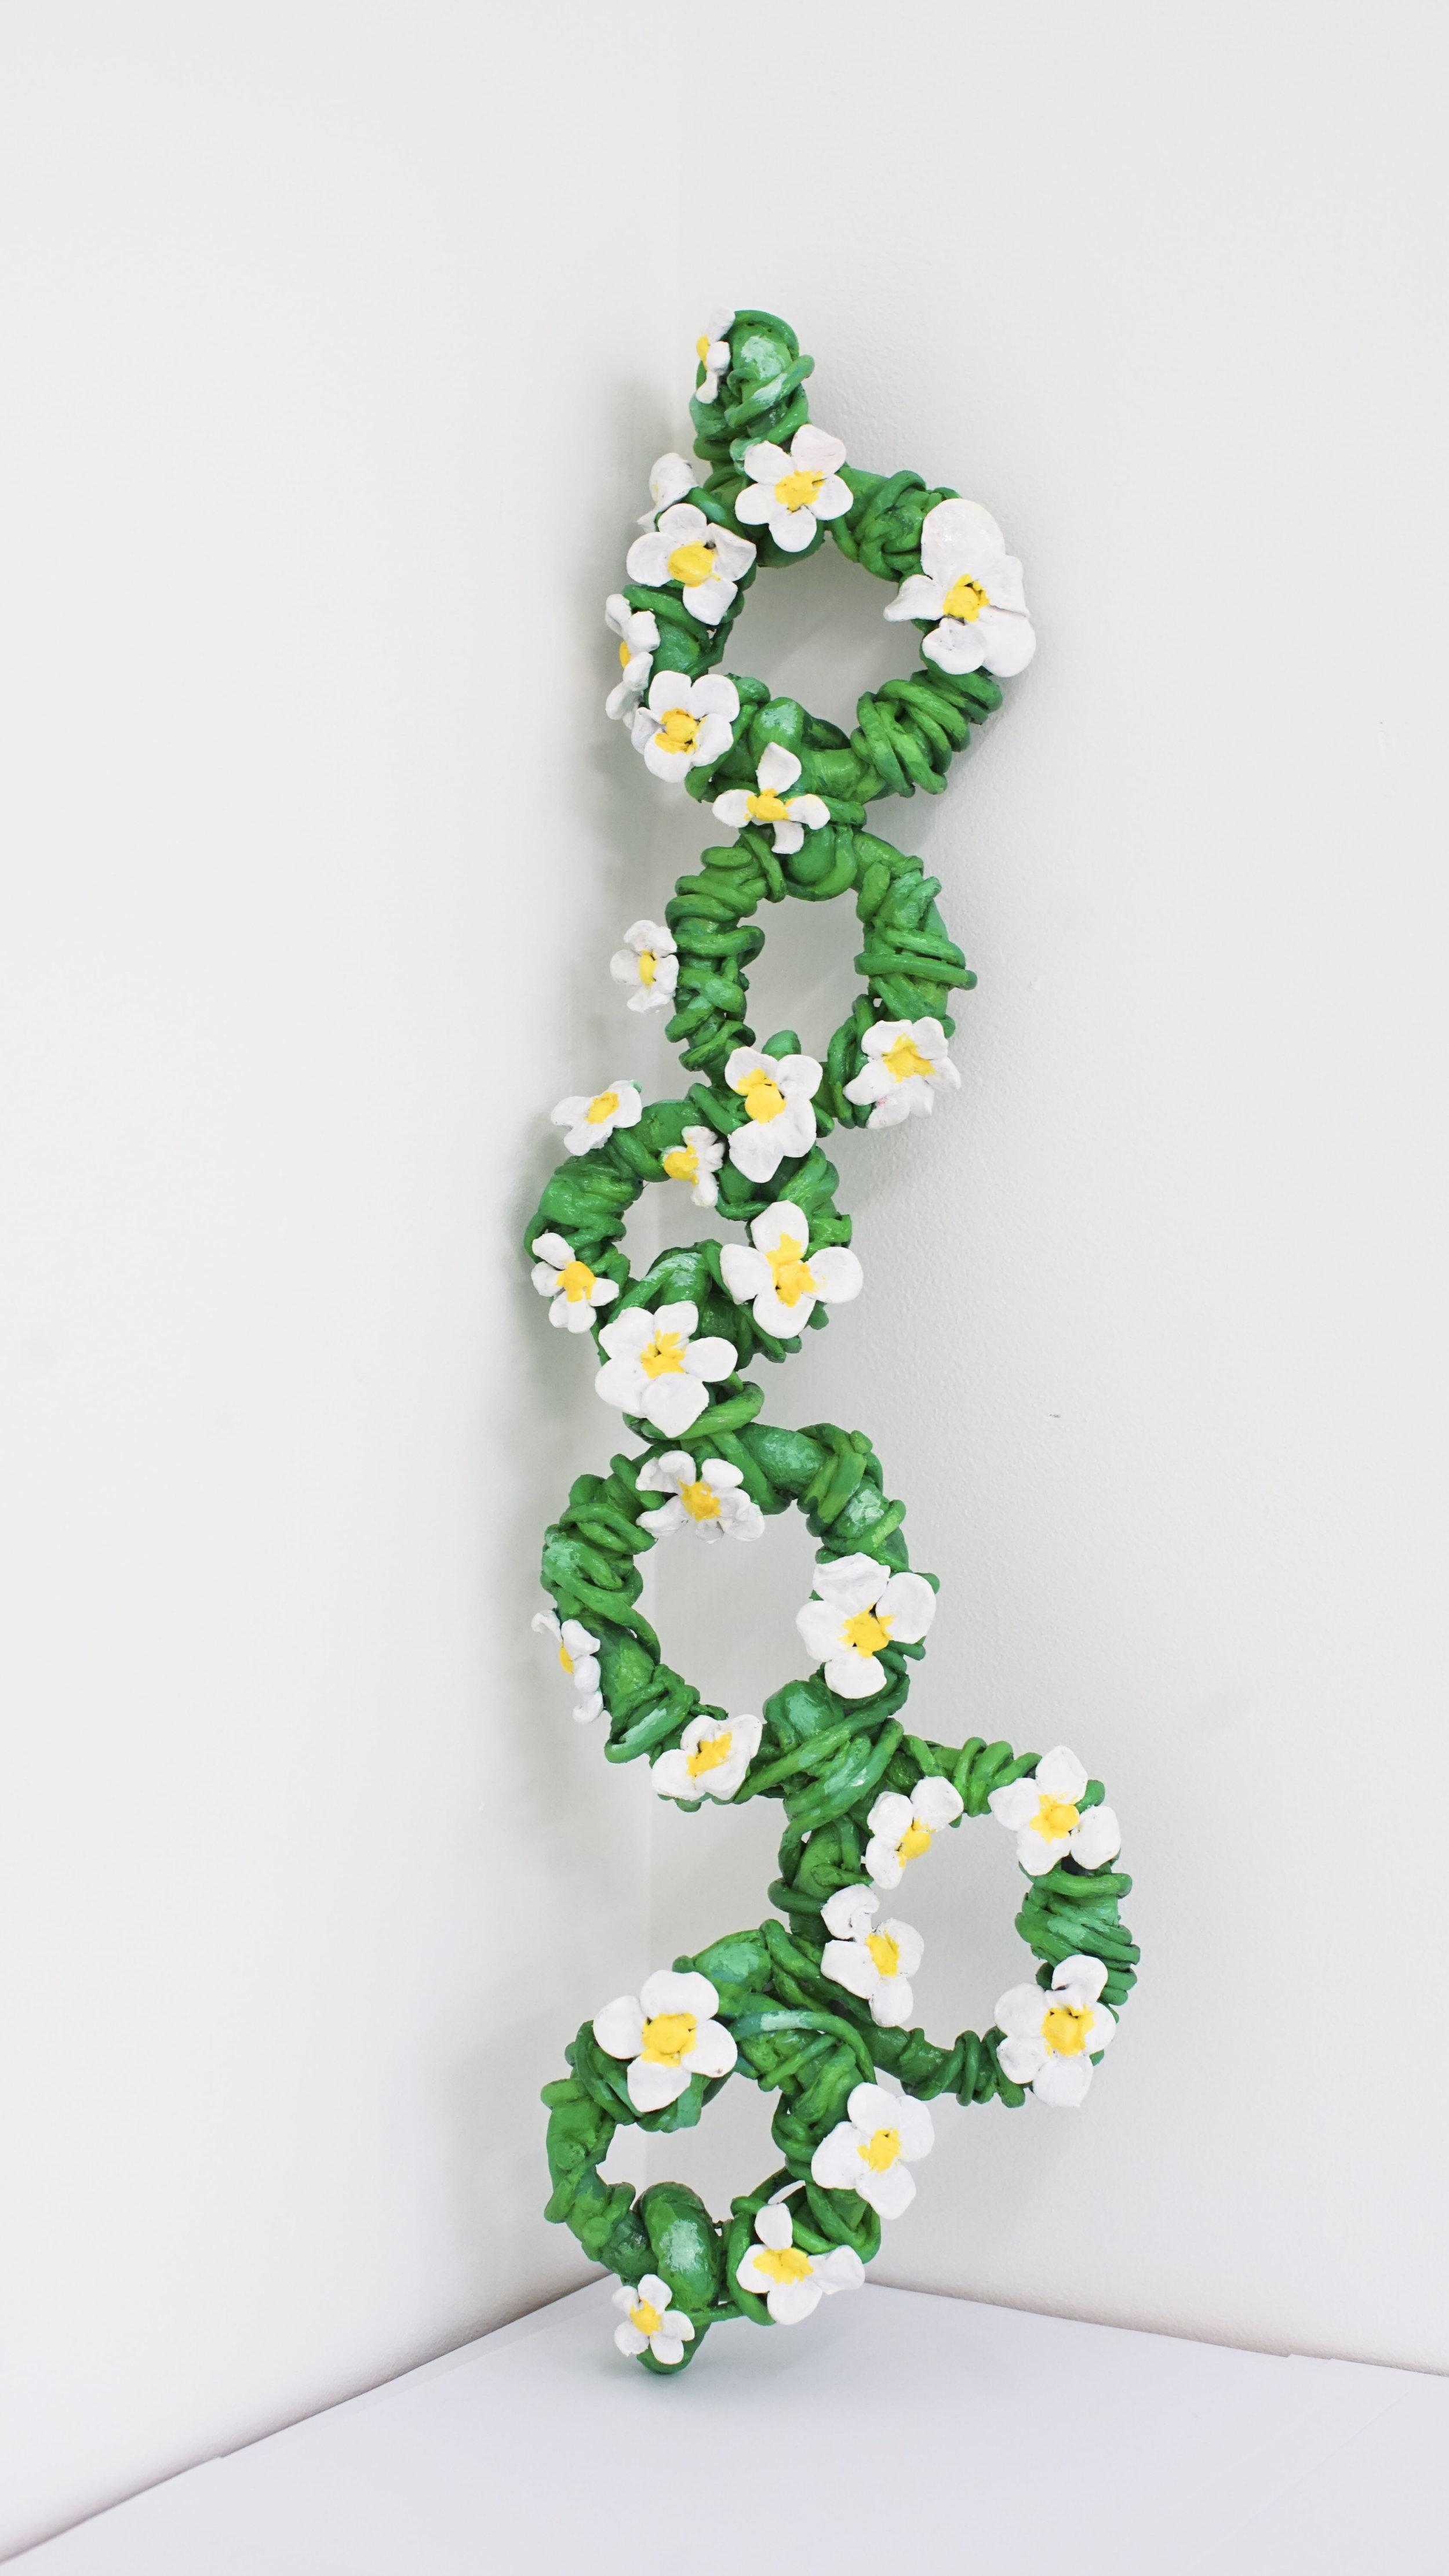 Daisy Chain 3.JPG